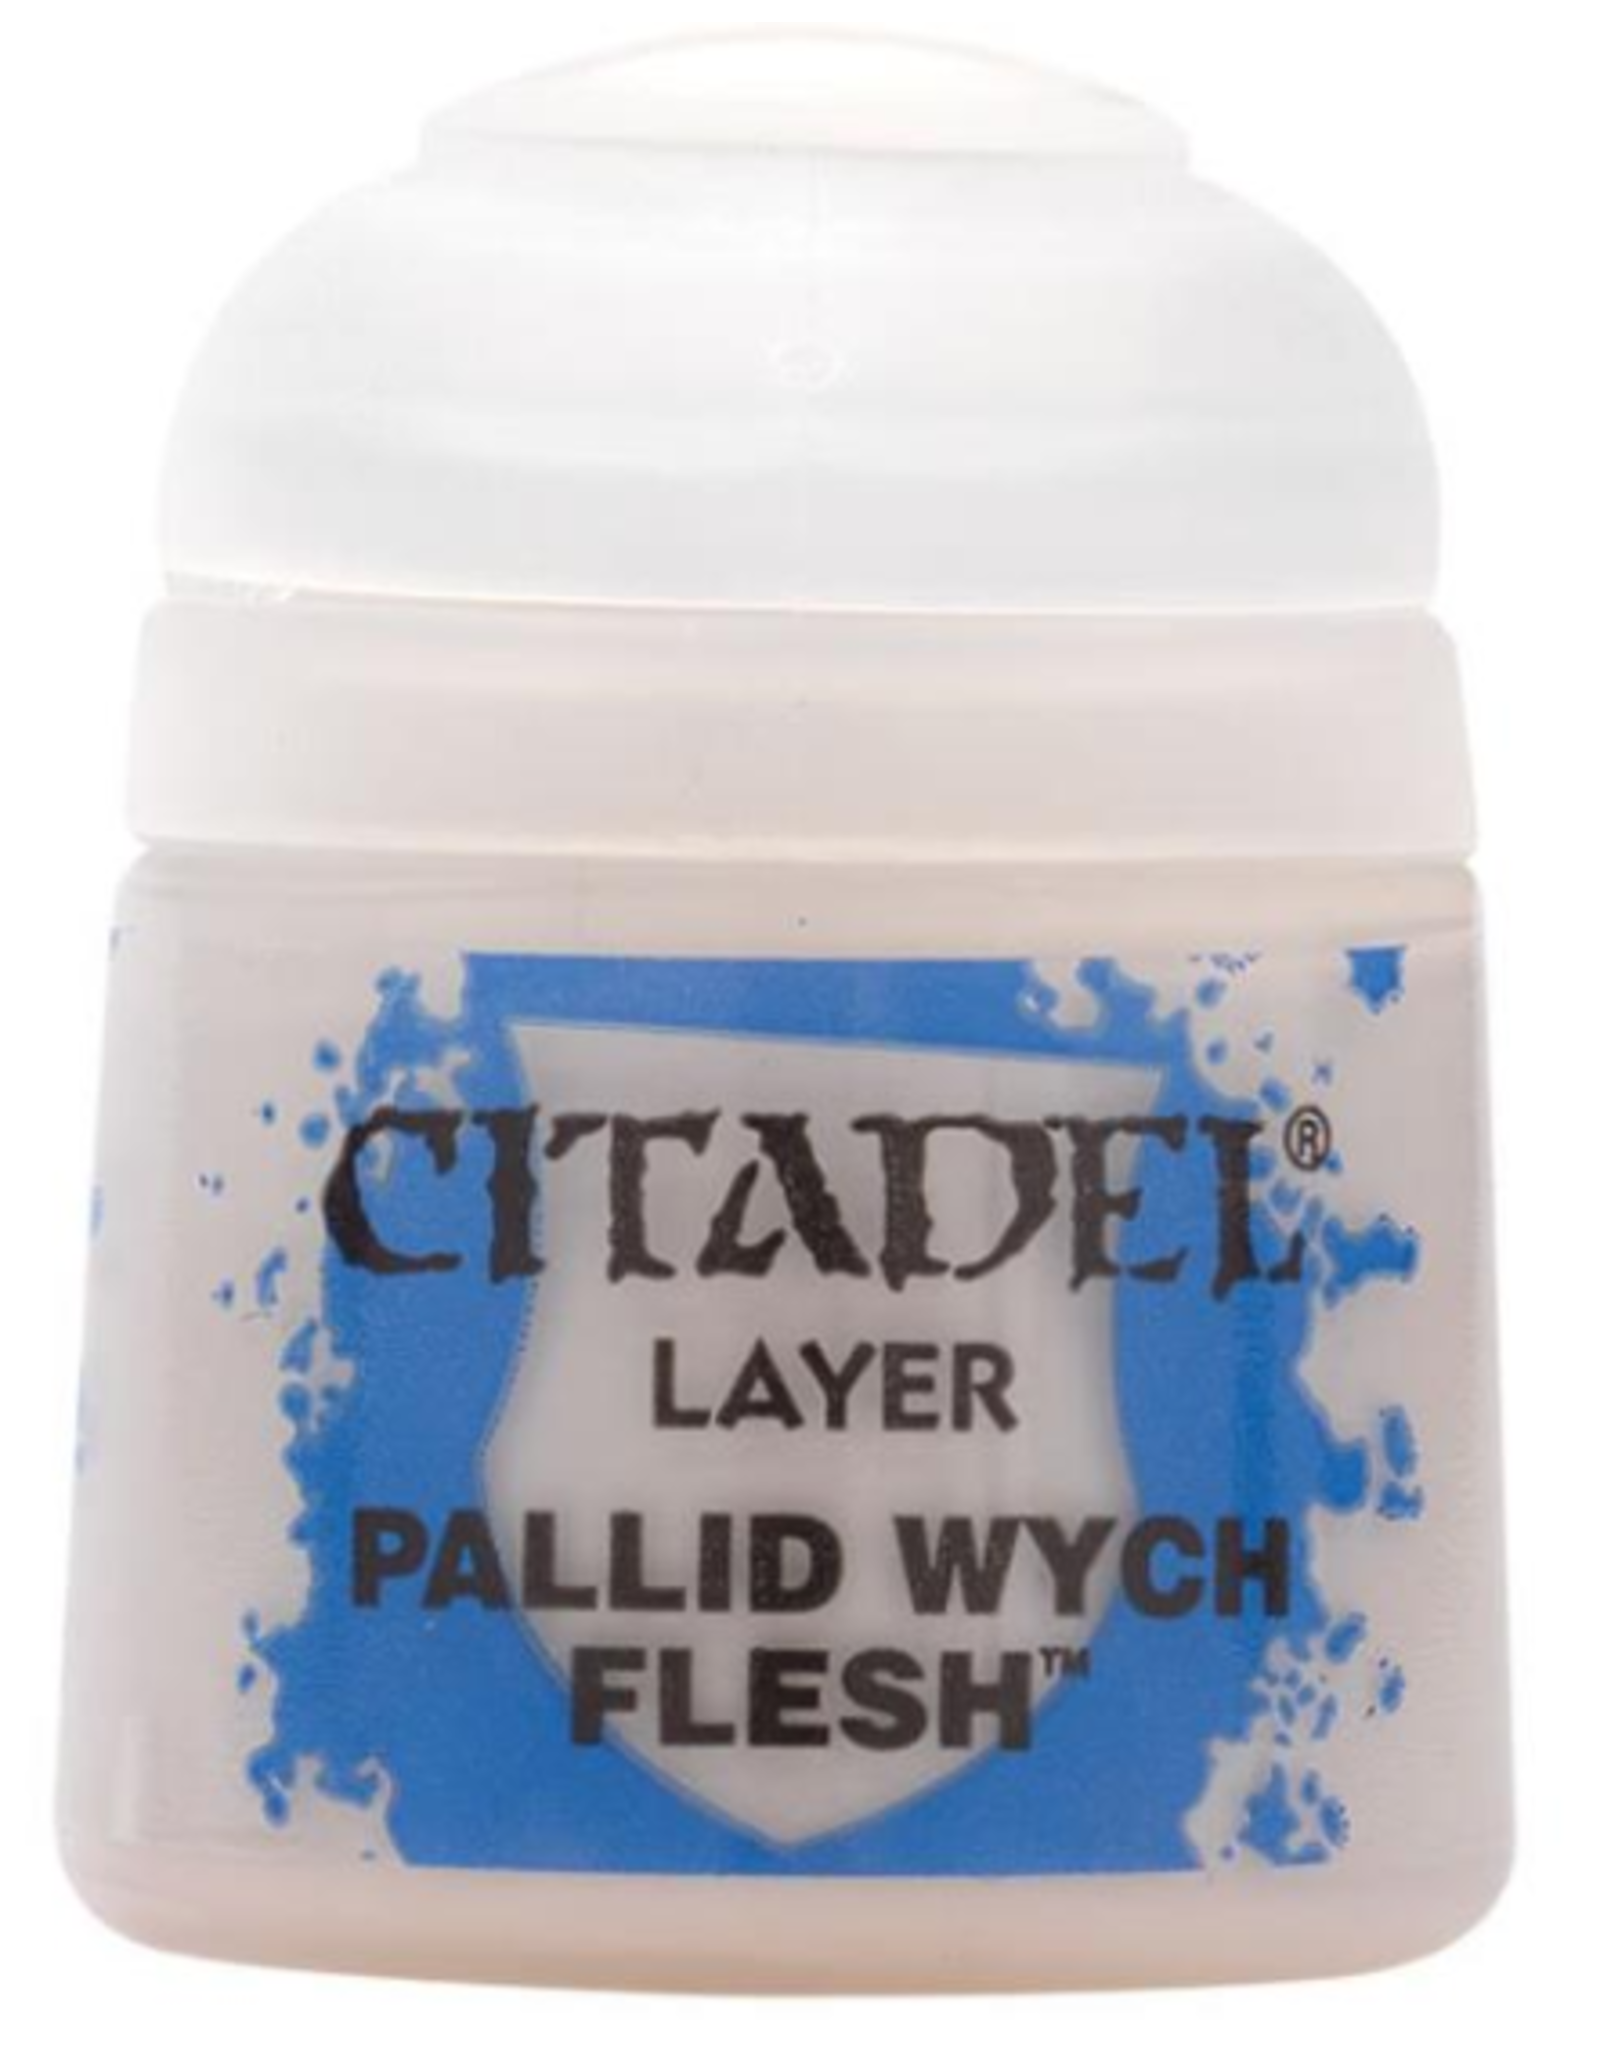 Games Workshop Citadel Paint: Pallid Wych Flesh 12ml